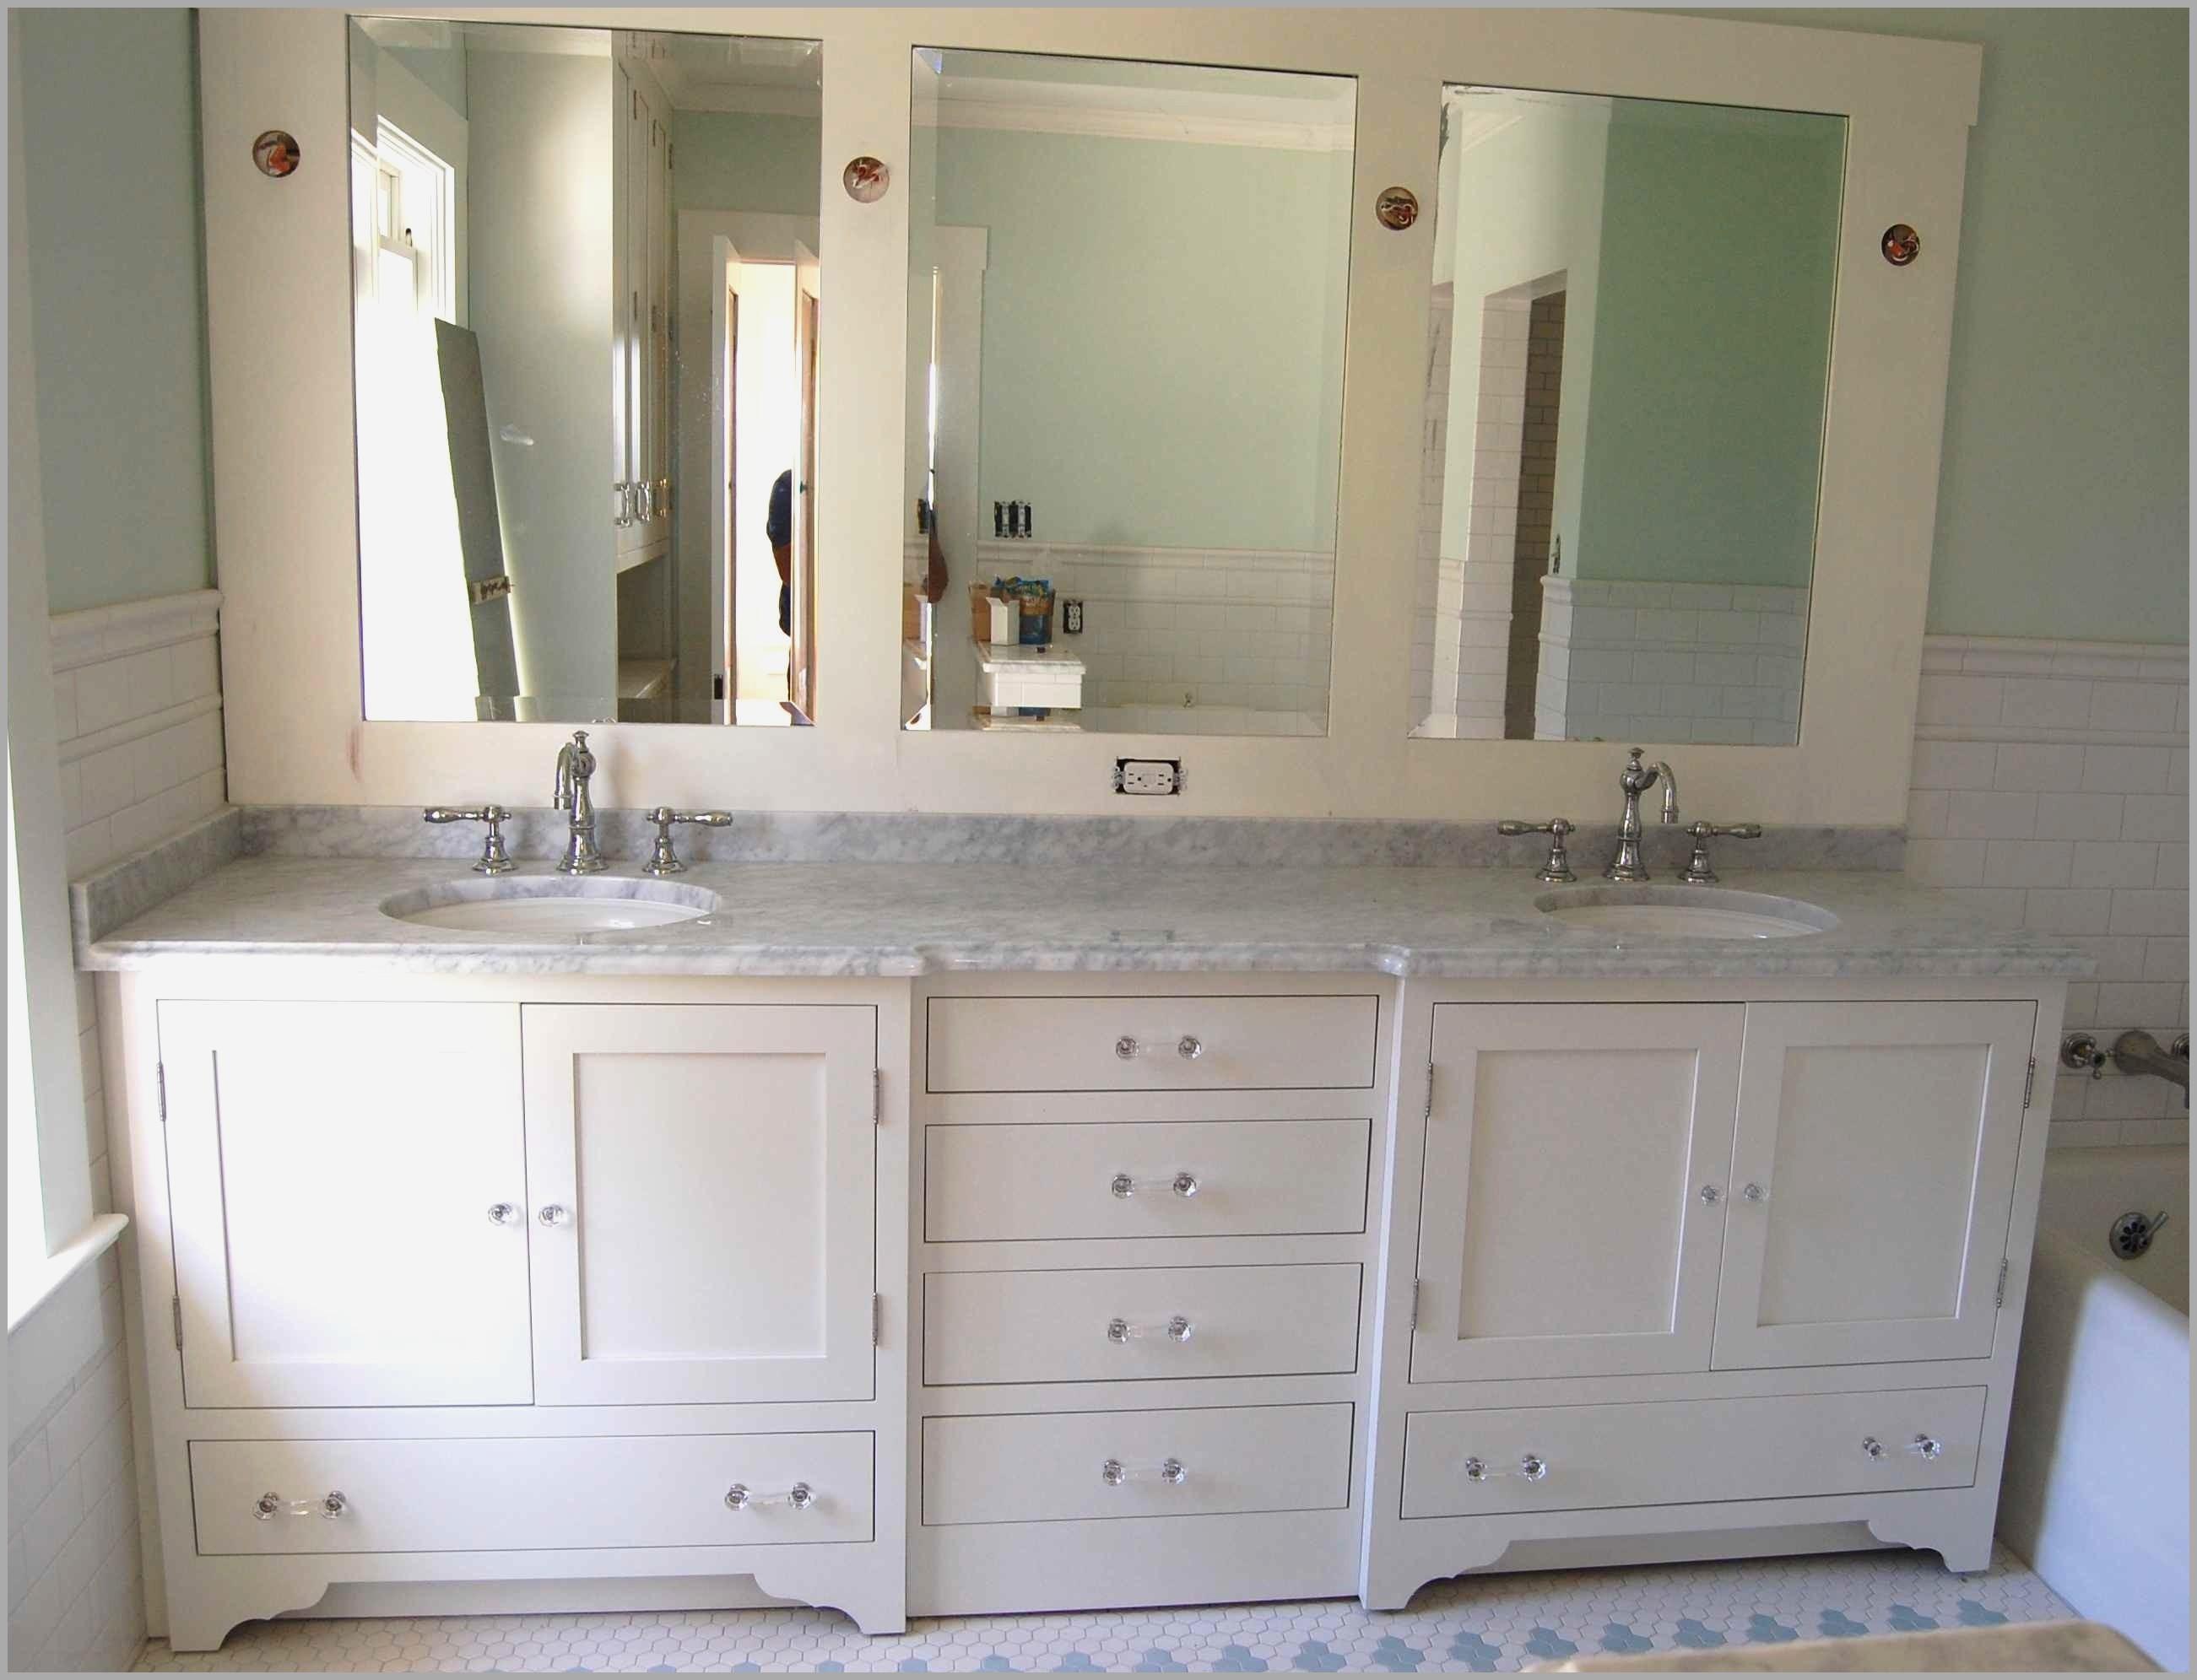 fantastic 80 bathroom vanity plan bathroom design ideas gallery rh bridgeportbenedumfestival com 80 inch bathroom vanity top 80 inch bathroom vanity mirror